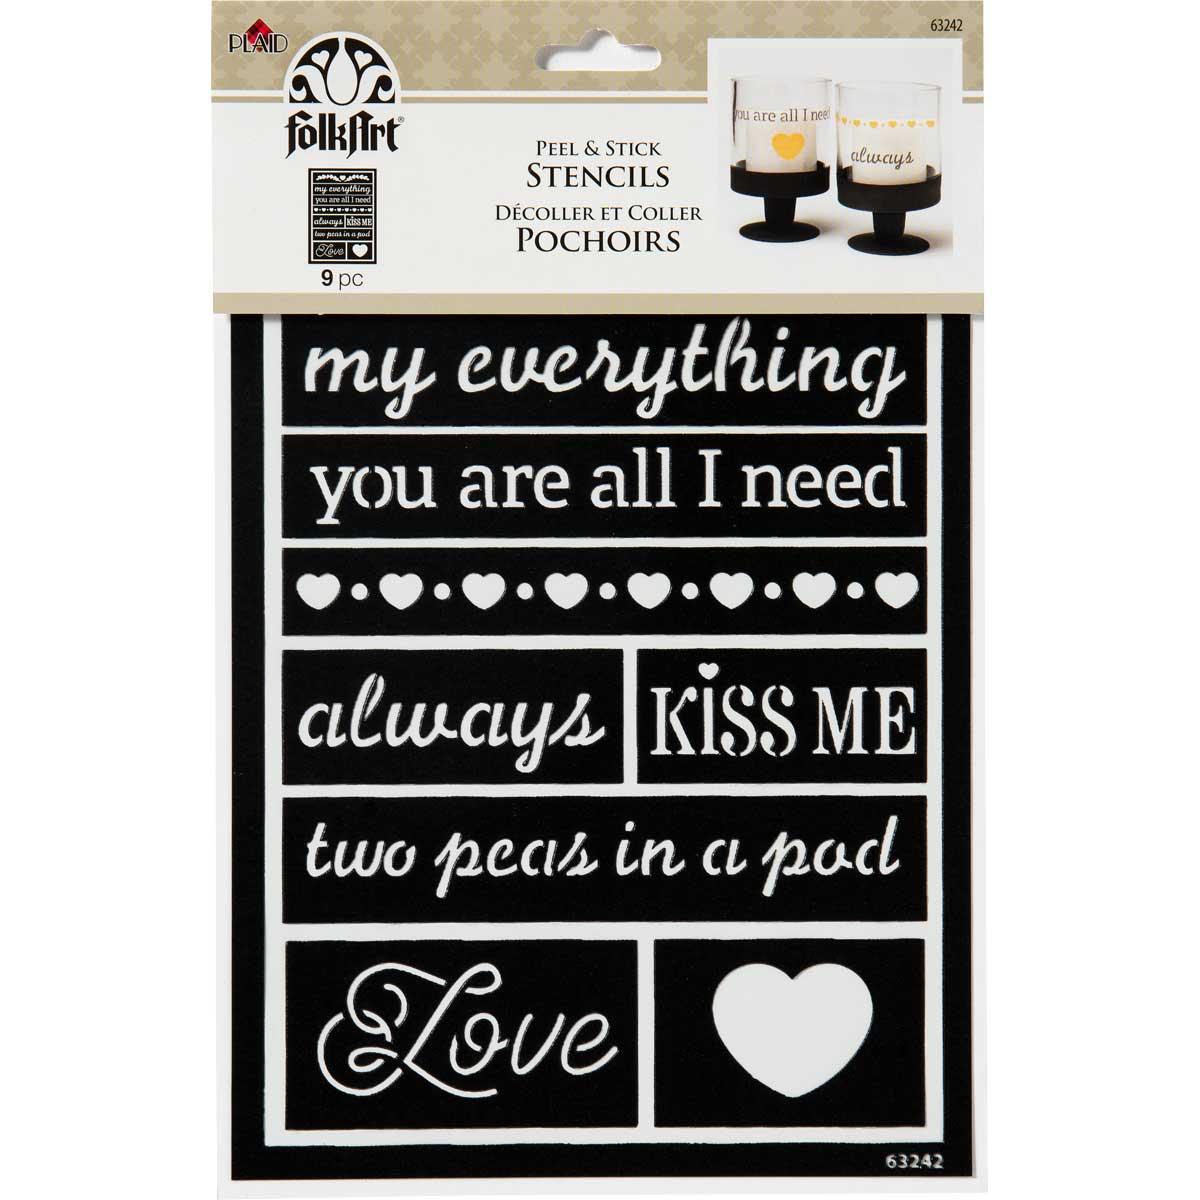 FolkArt ® Peel & Stick Painting Stencils - Loving Words